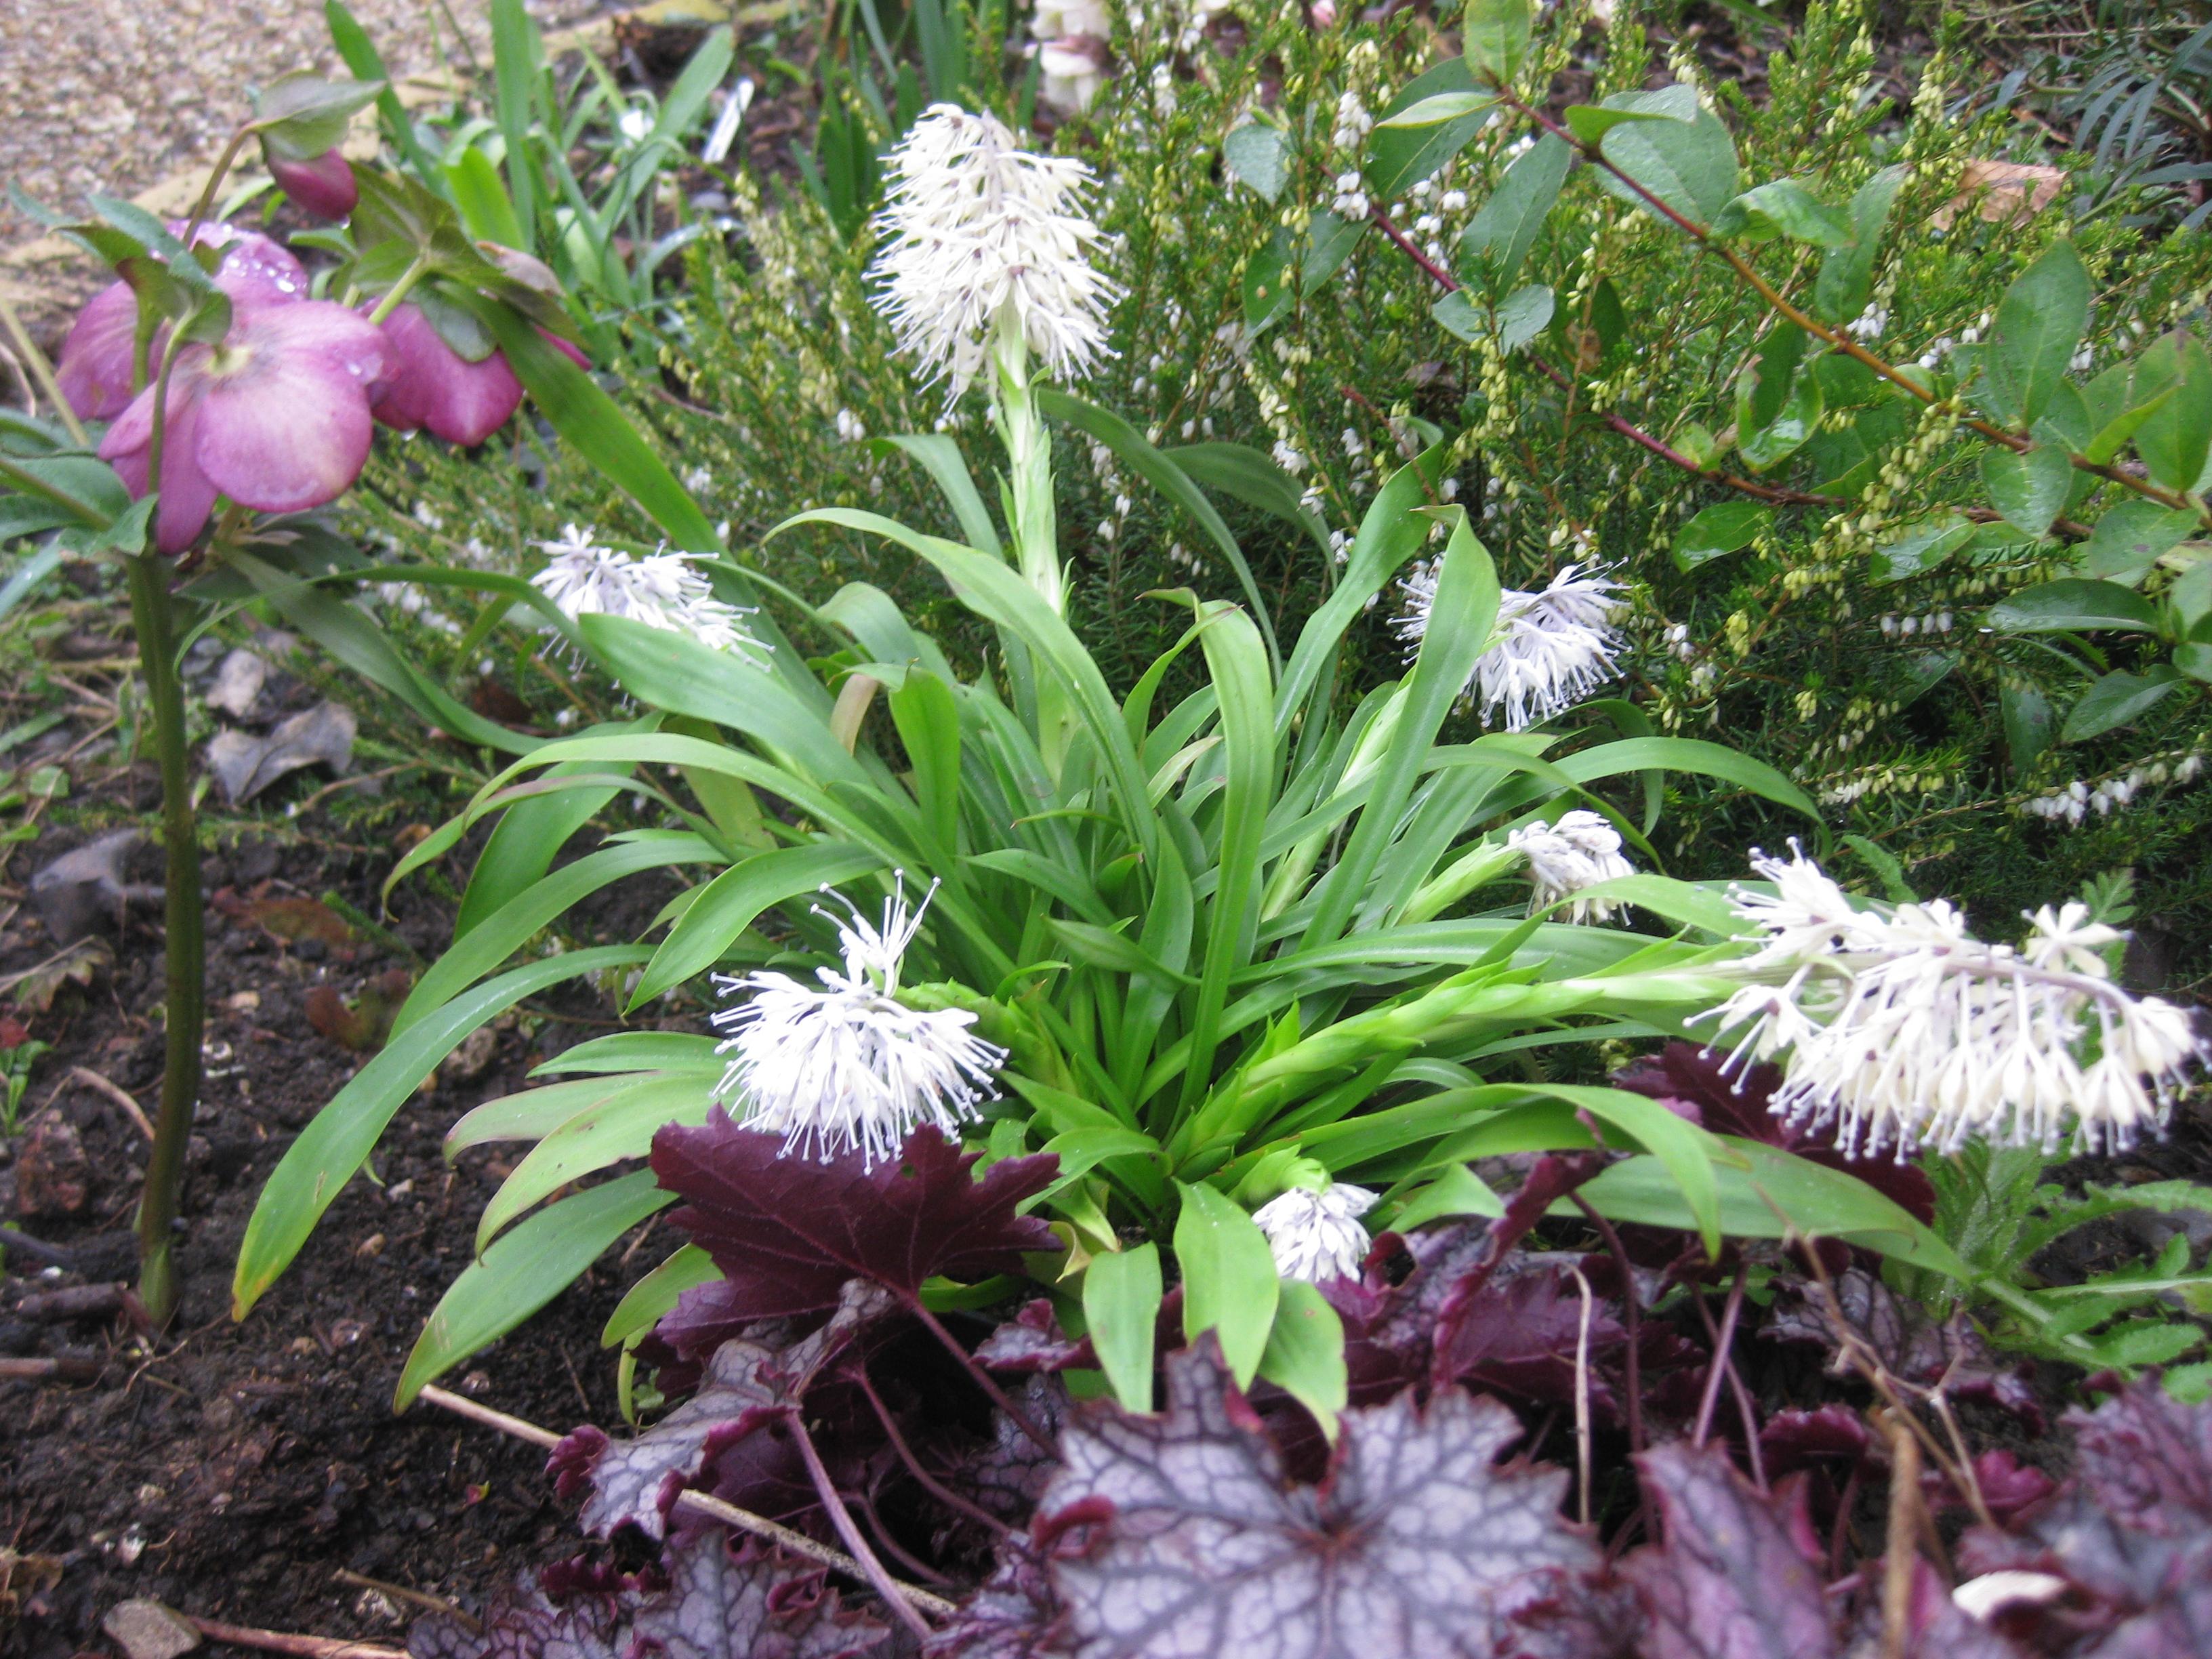 Ypsilandra Thibetica The Blooming Garden